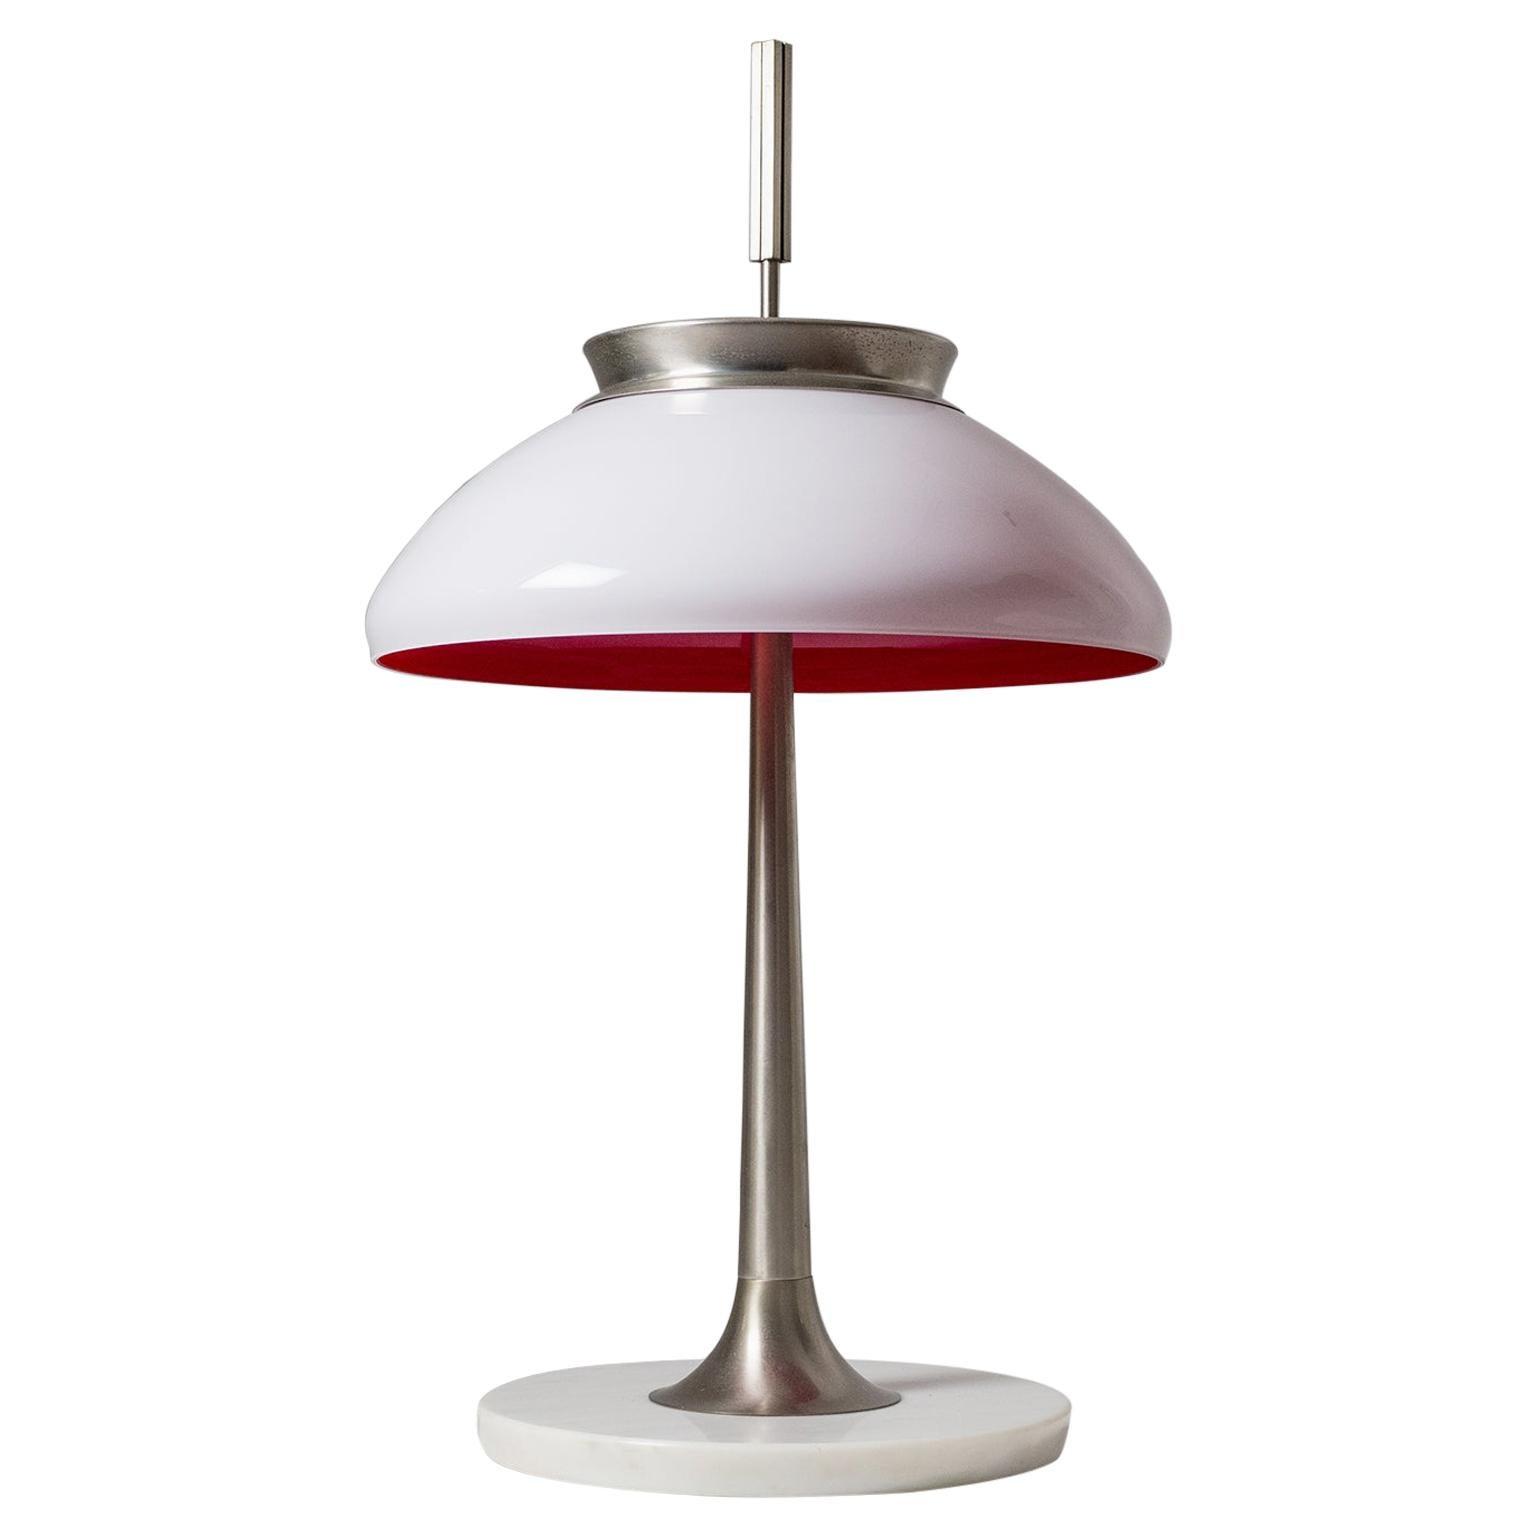 Stilnovo Table Lamp, 1950s, Nickel and Glass